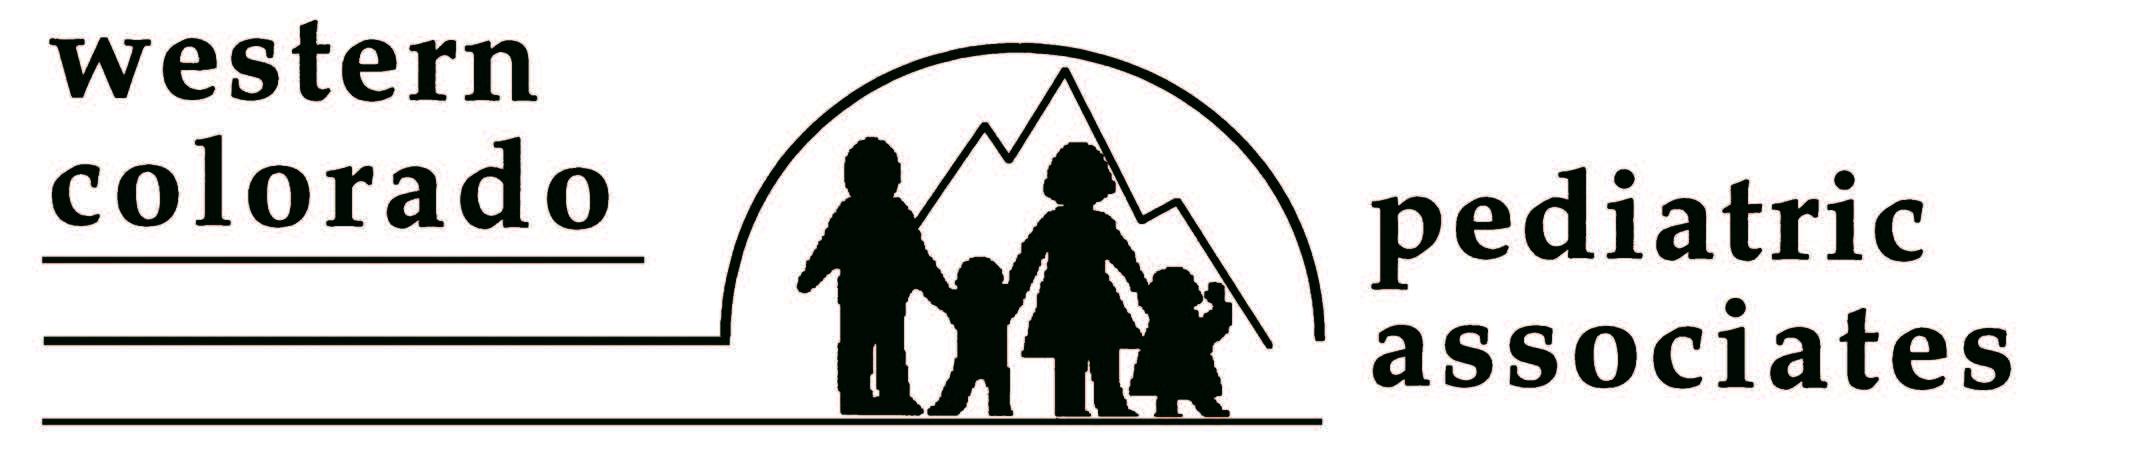 Western Colorado Pediatric Associates